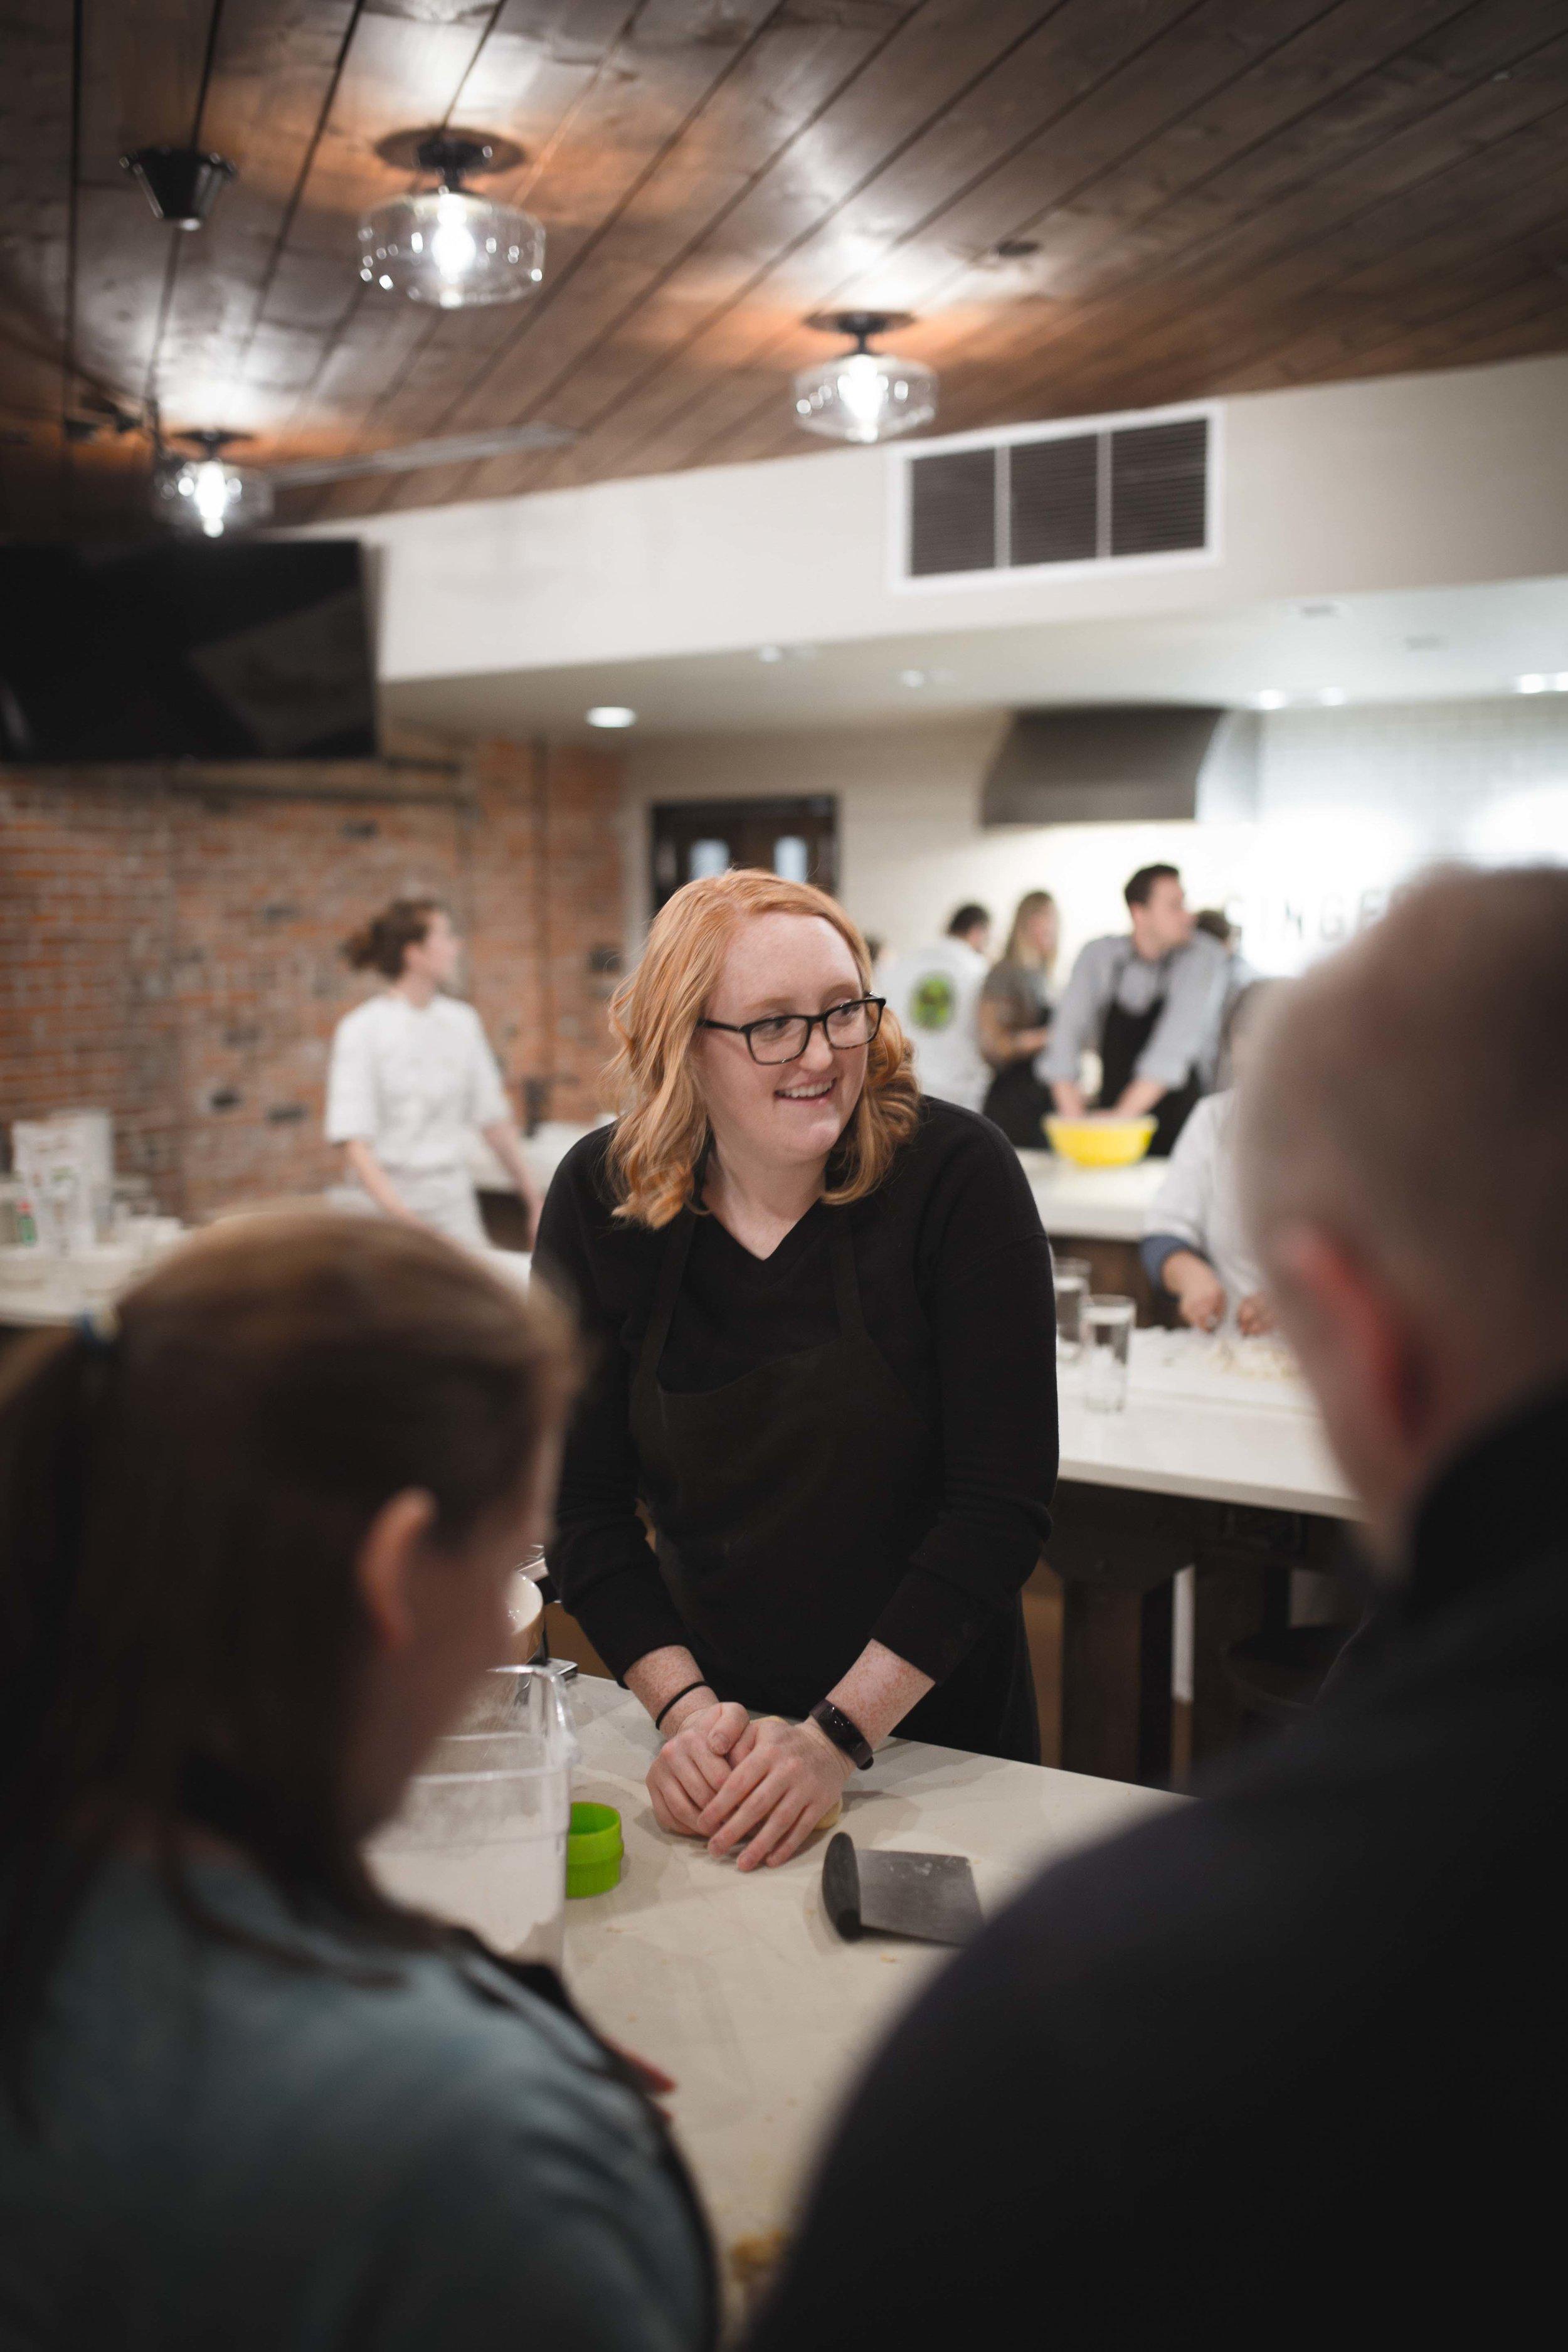 GingerandBaker-JuliyJuan-CookingClass-Feb28-50.jpg